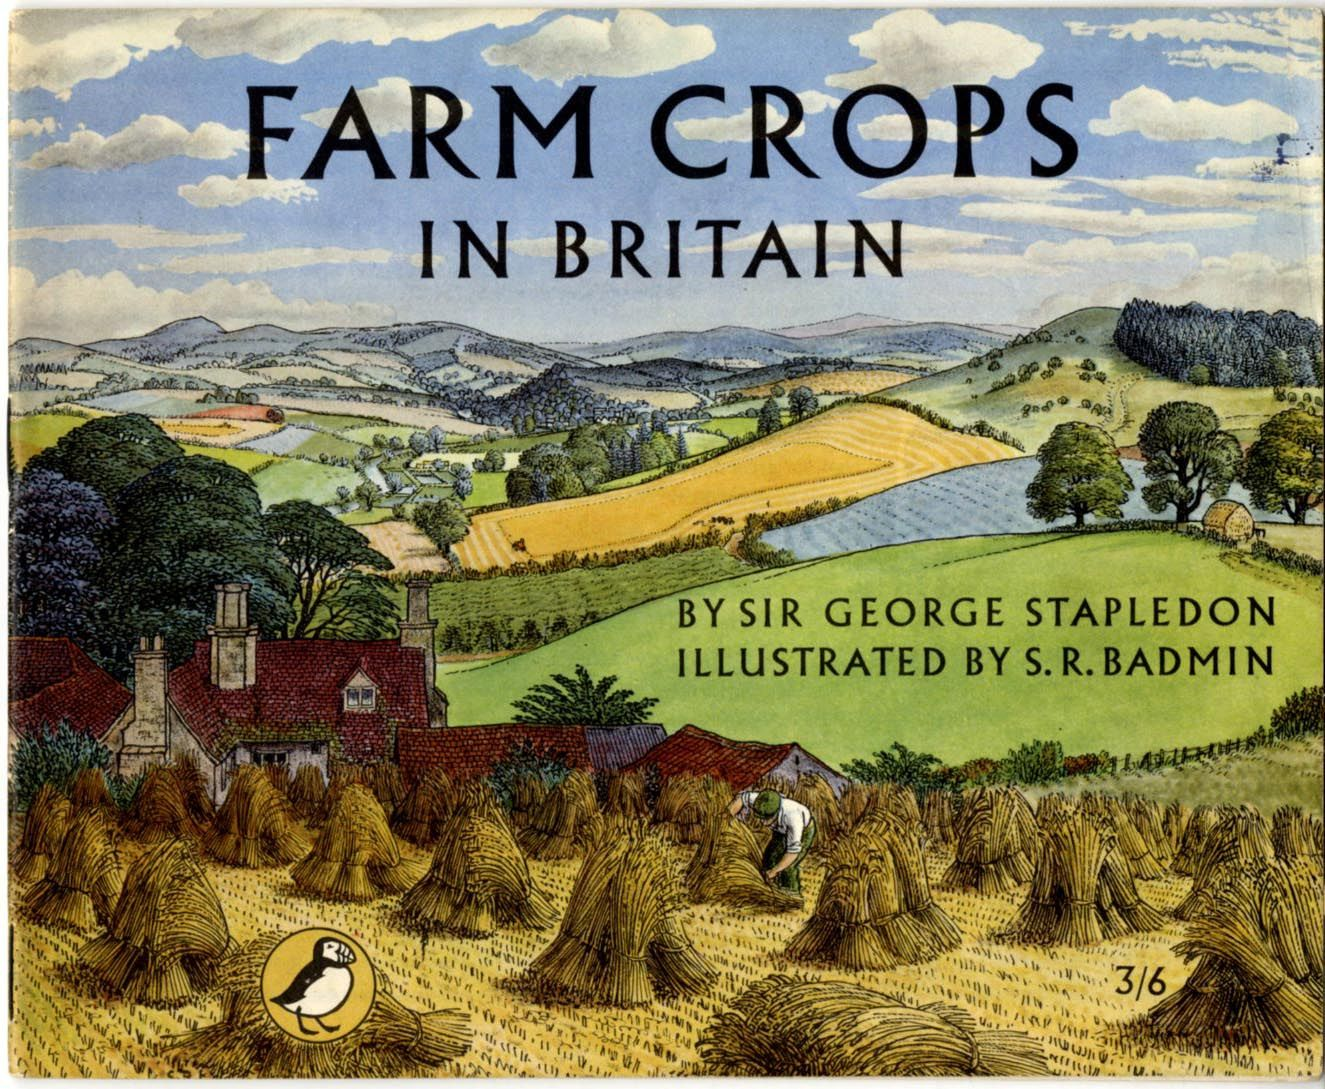 S.R.Badmin, Farm Crops in Britain 1955 for Puffin